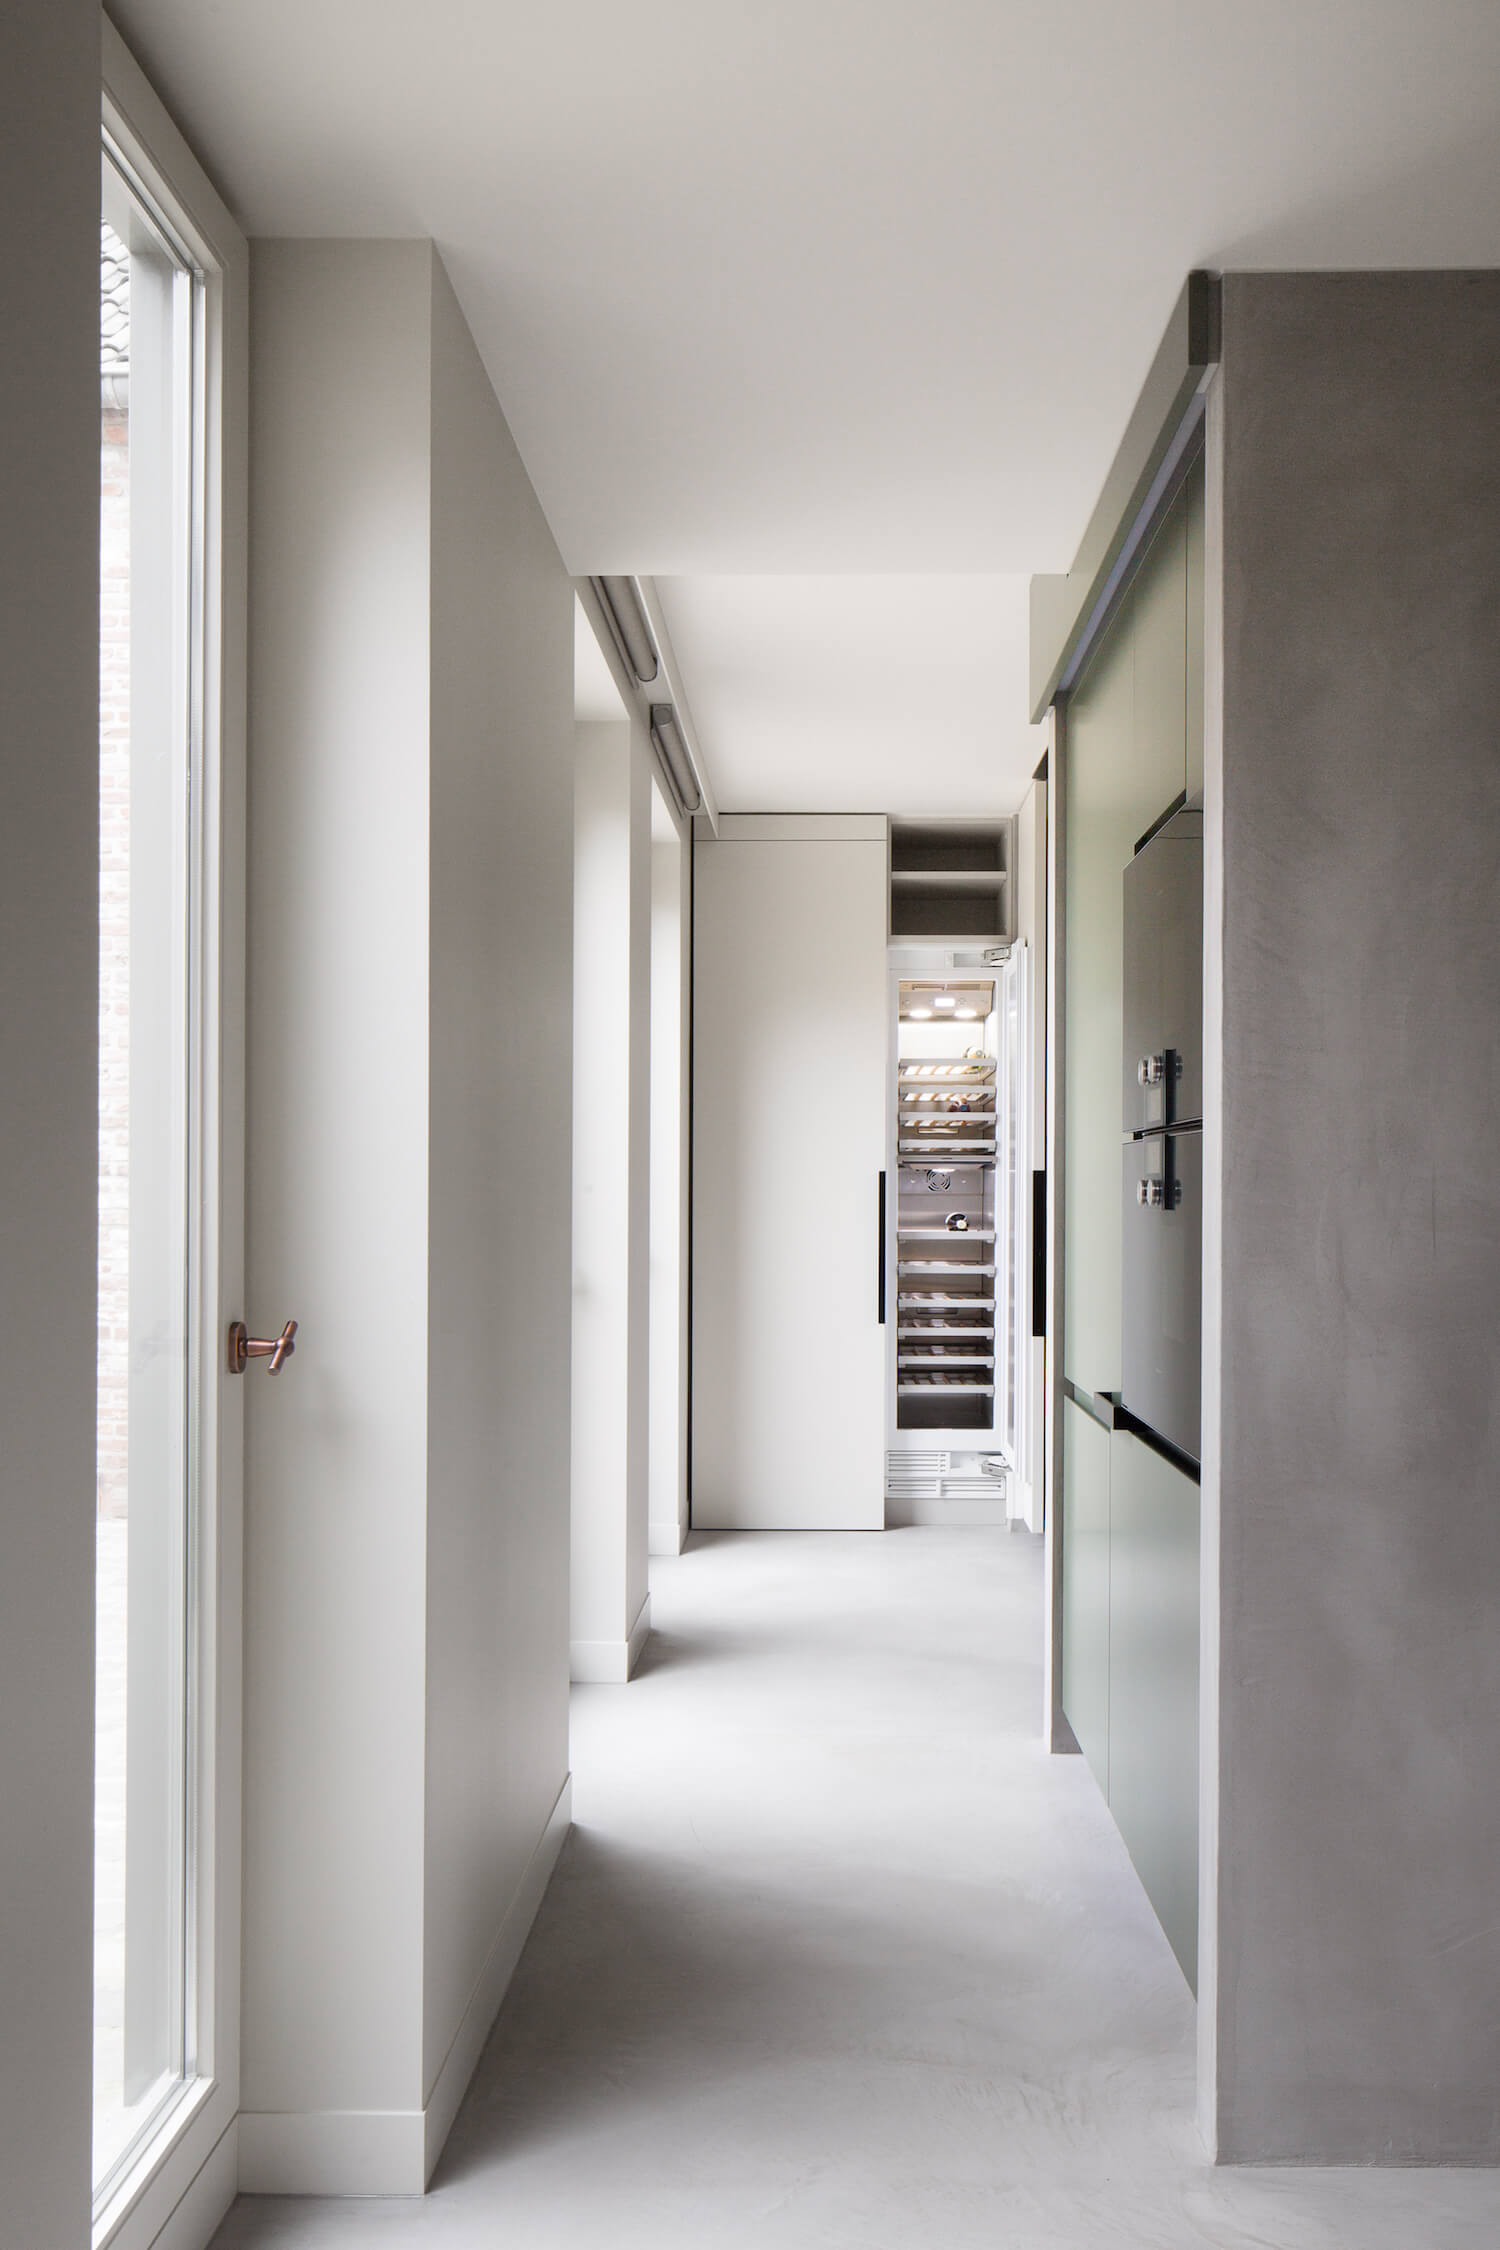 est living frederic kielemoes cafeine belgian apartment 10